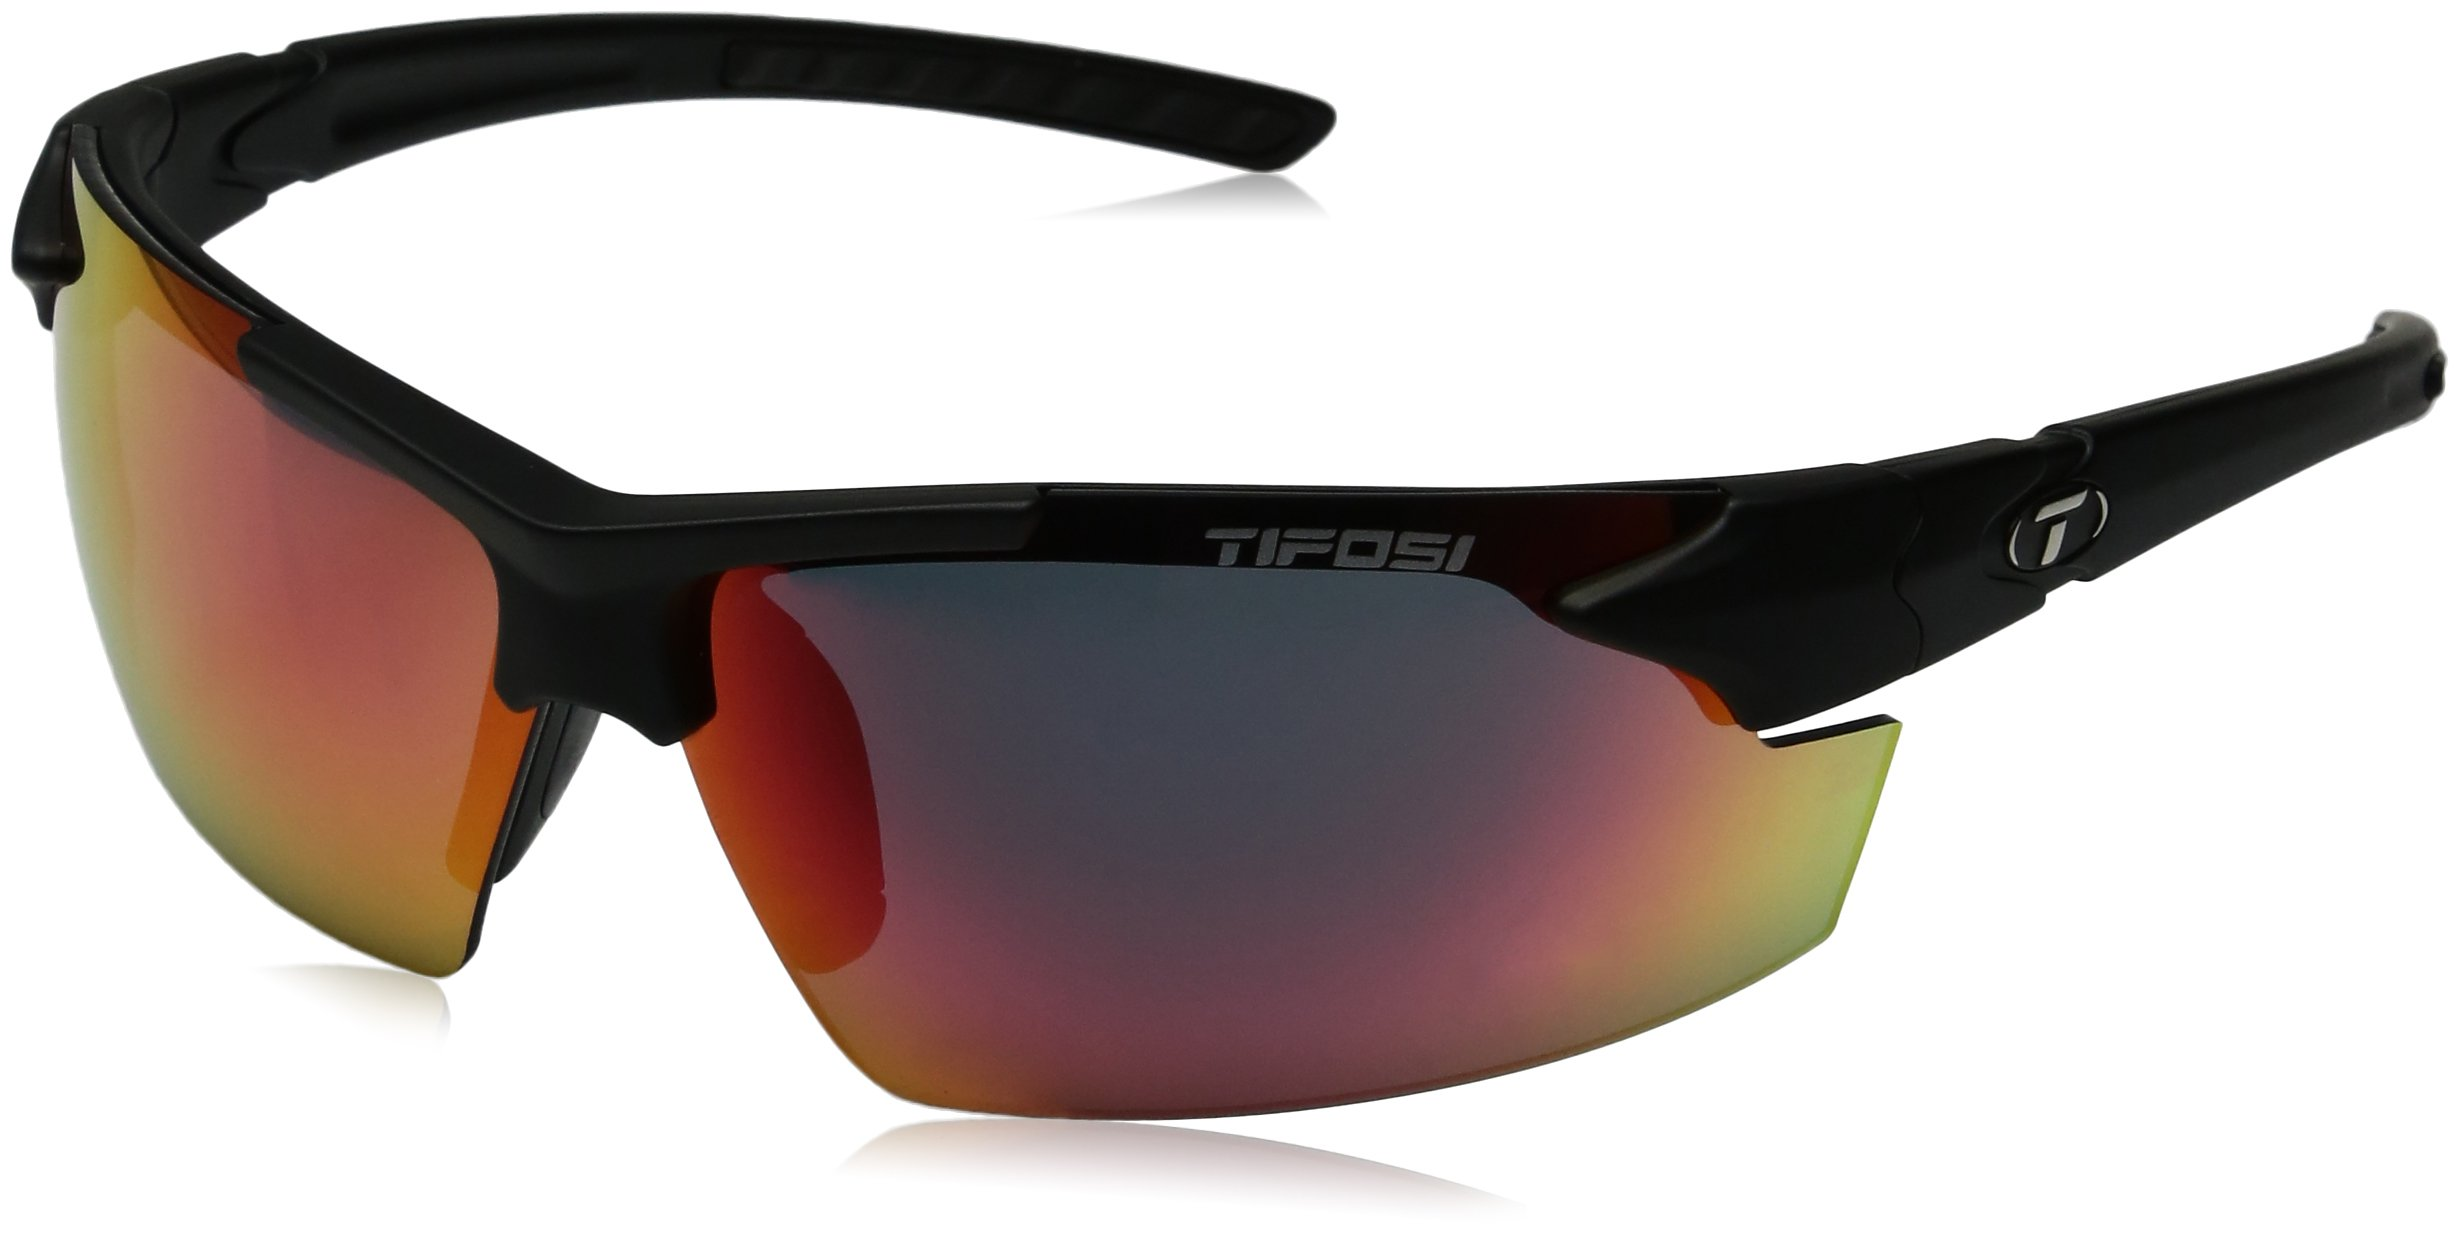 Tifosi Golf Jet Fc Wrap Sunglasses, Matte Black, Regular